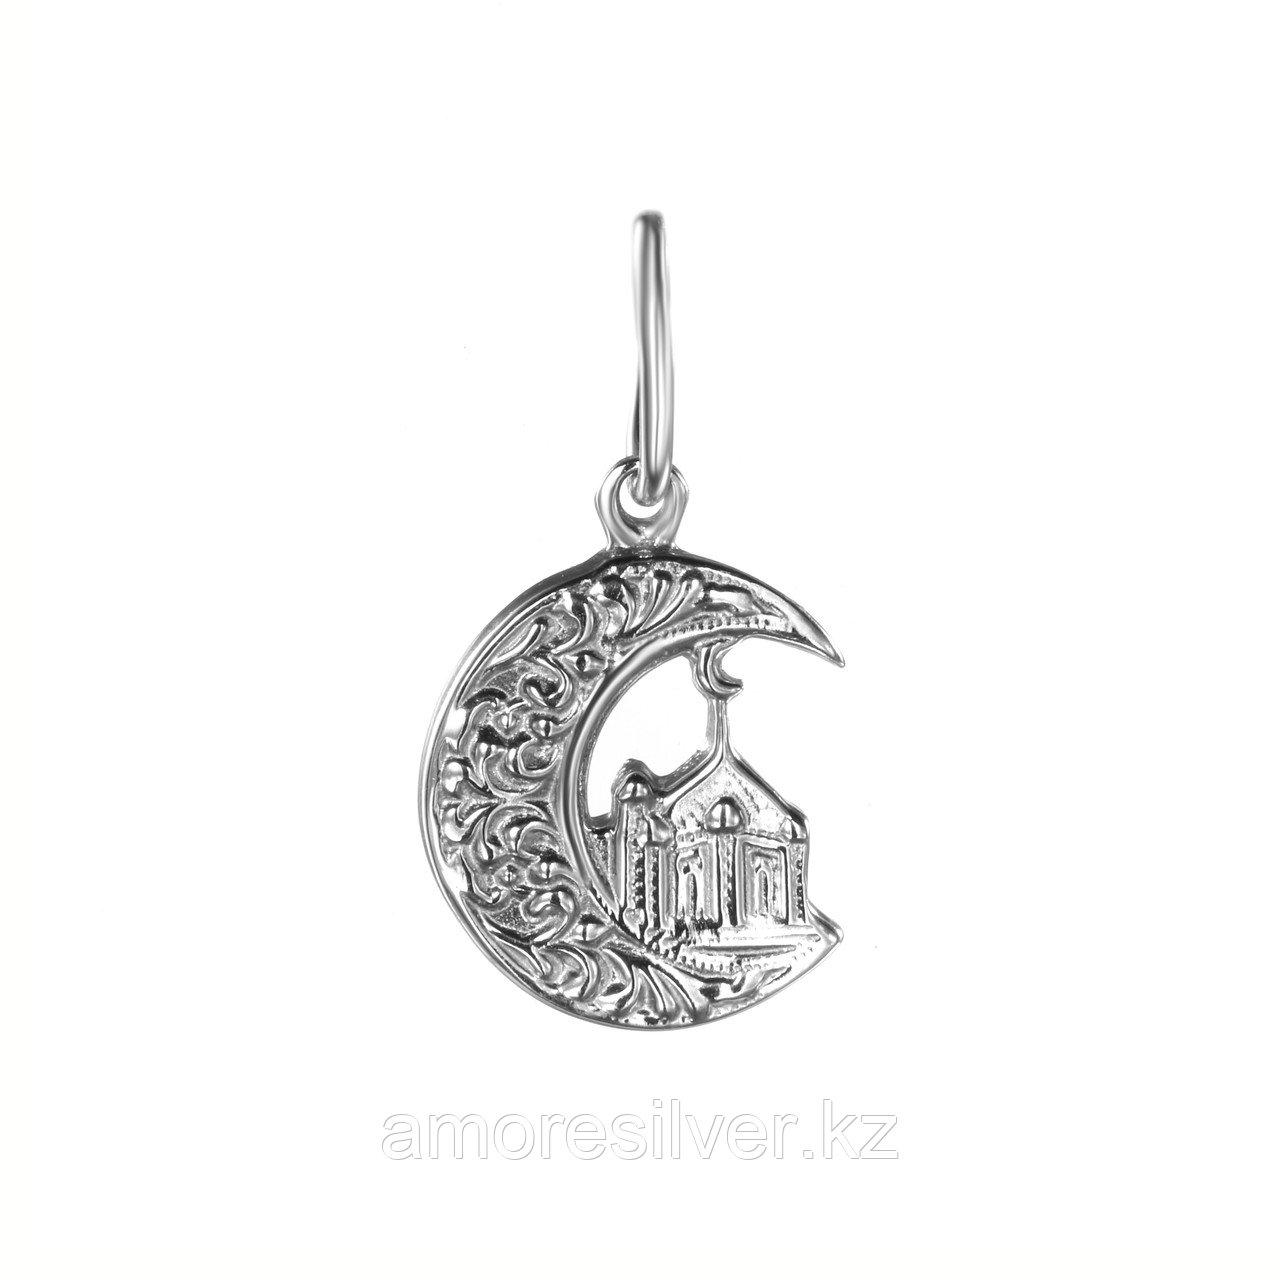 SOKOLOV серебро с родием, фианит юи 114908р